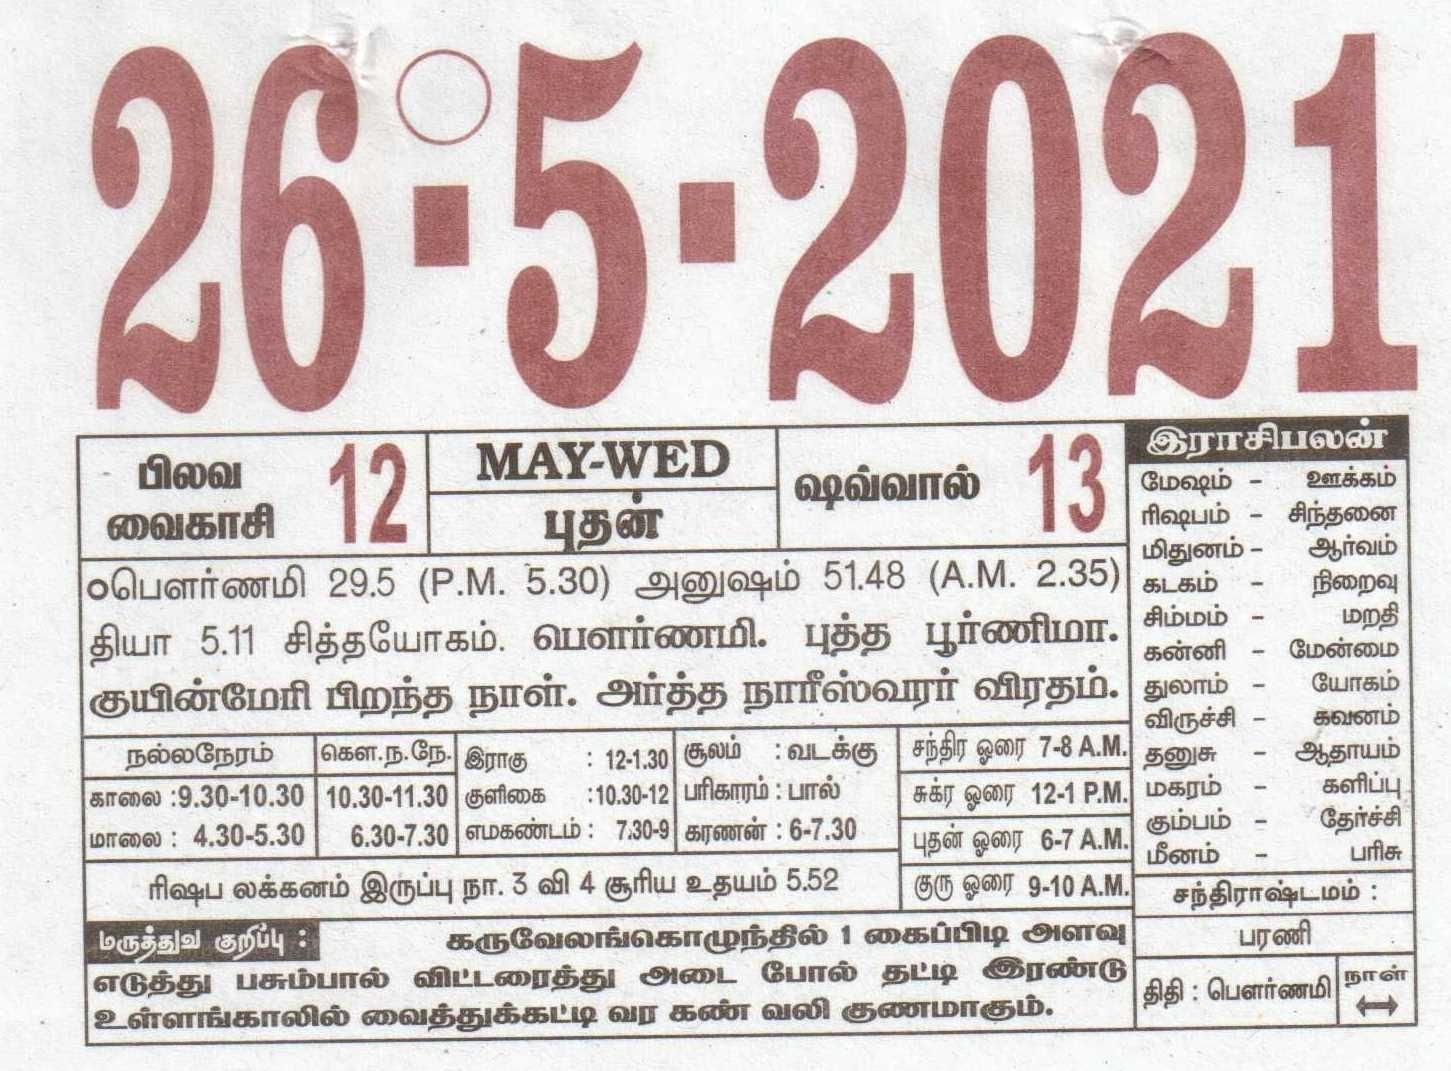 26-05-2021 Daily Calendar | Date 26 , January Daily Tear Off Calendar | Daily Panchangam Rasi Palan June 2021 Tamil Daily Calendar